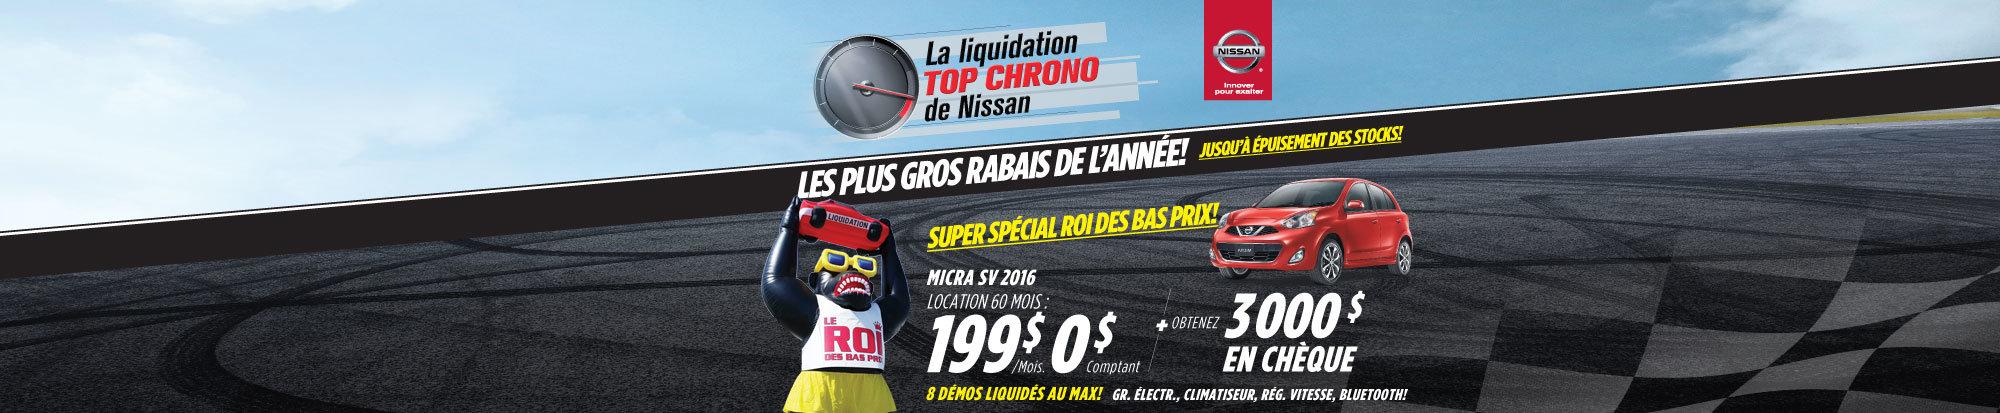 Liquidation top chrono Micra SV 2016